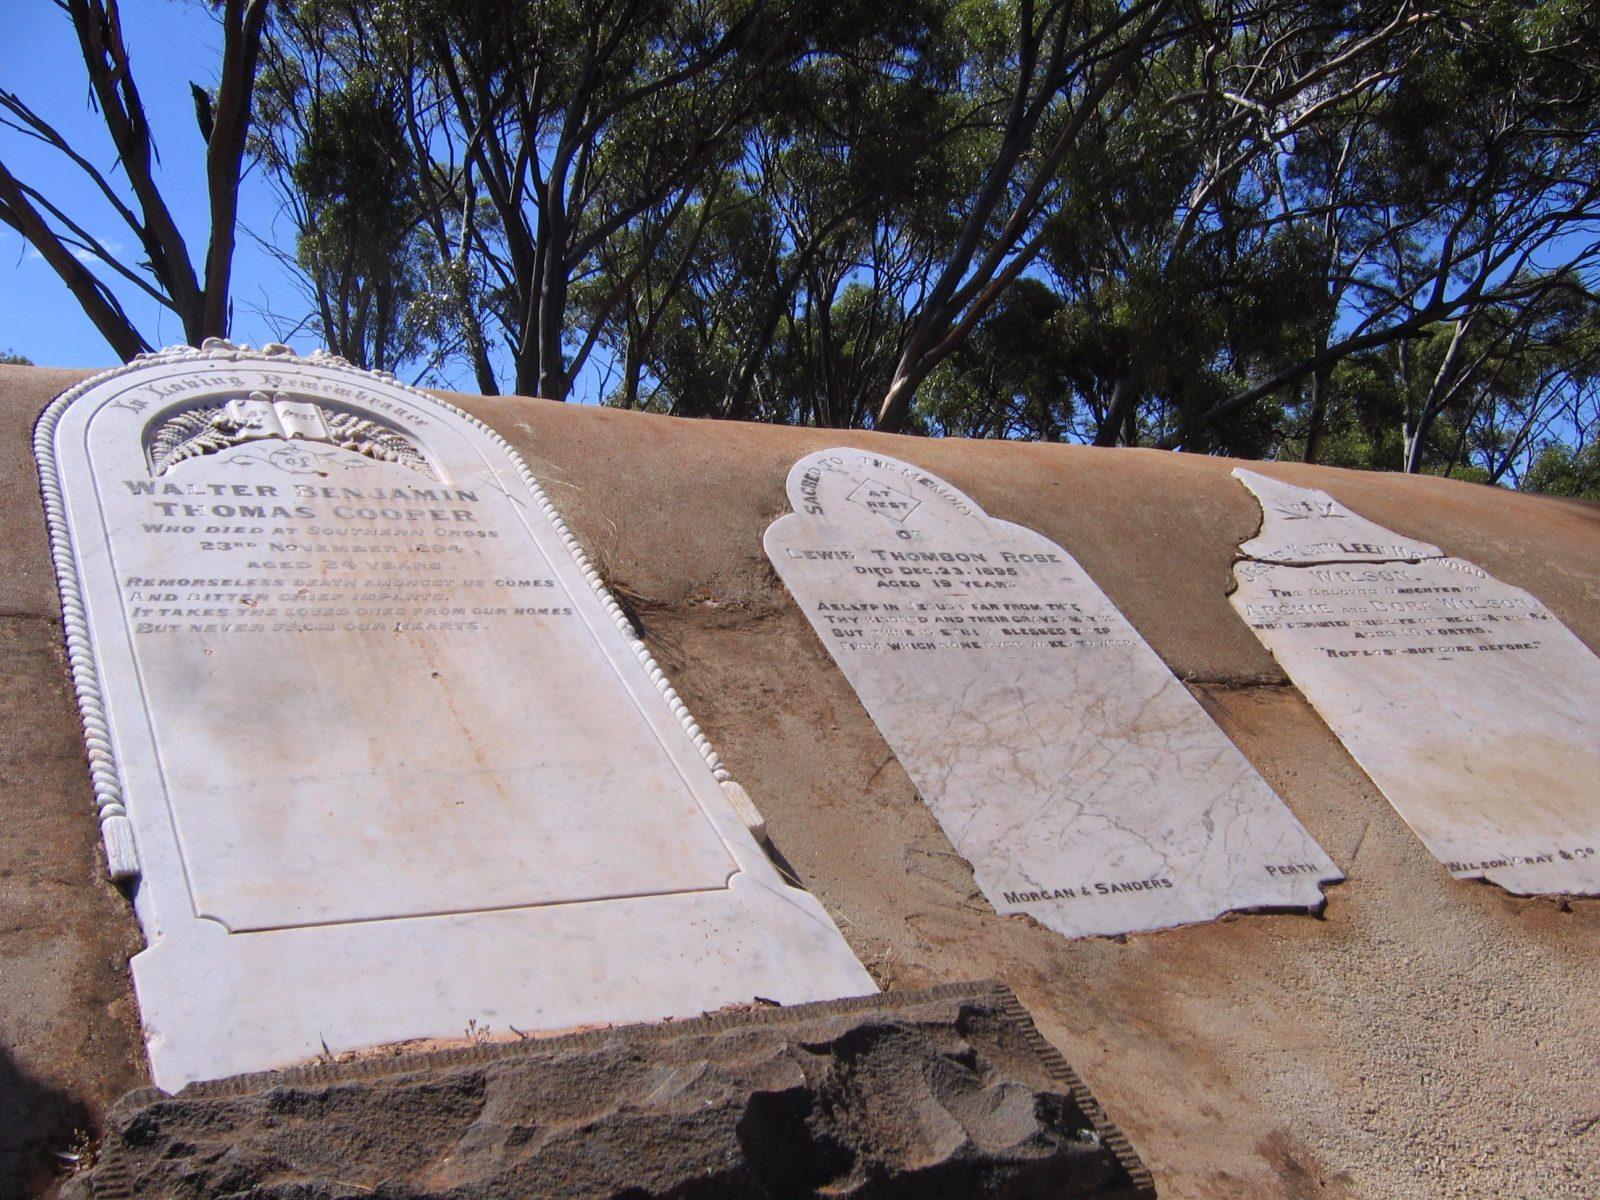 Old Southern Cross Cemetery, Southern Cross, Western Australia